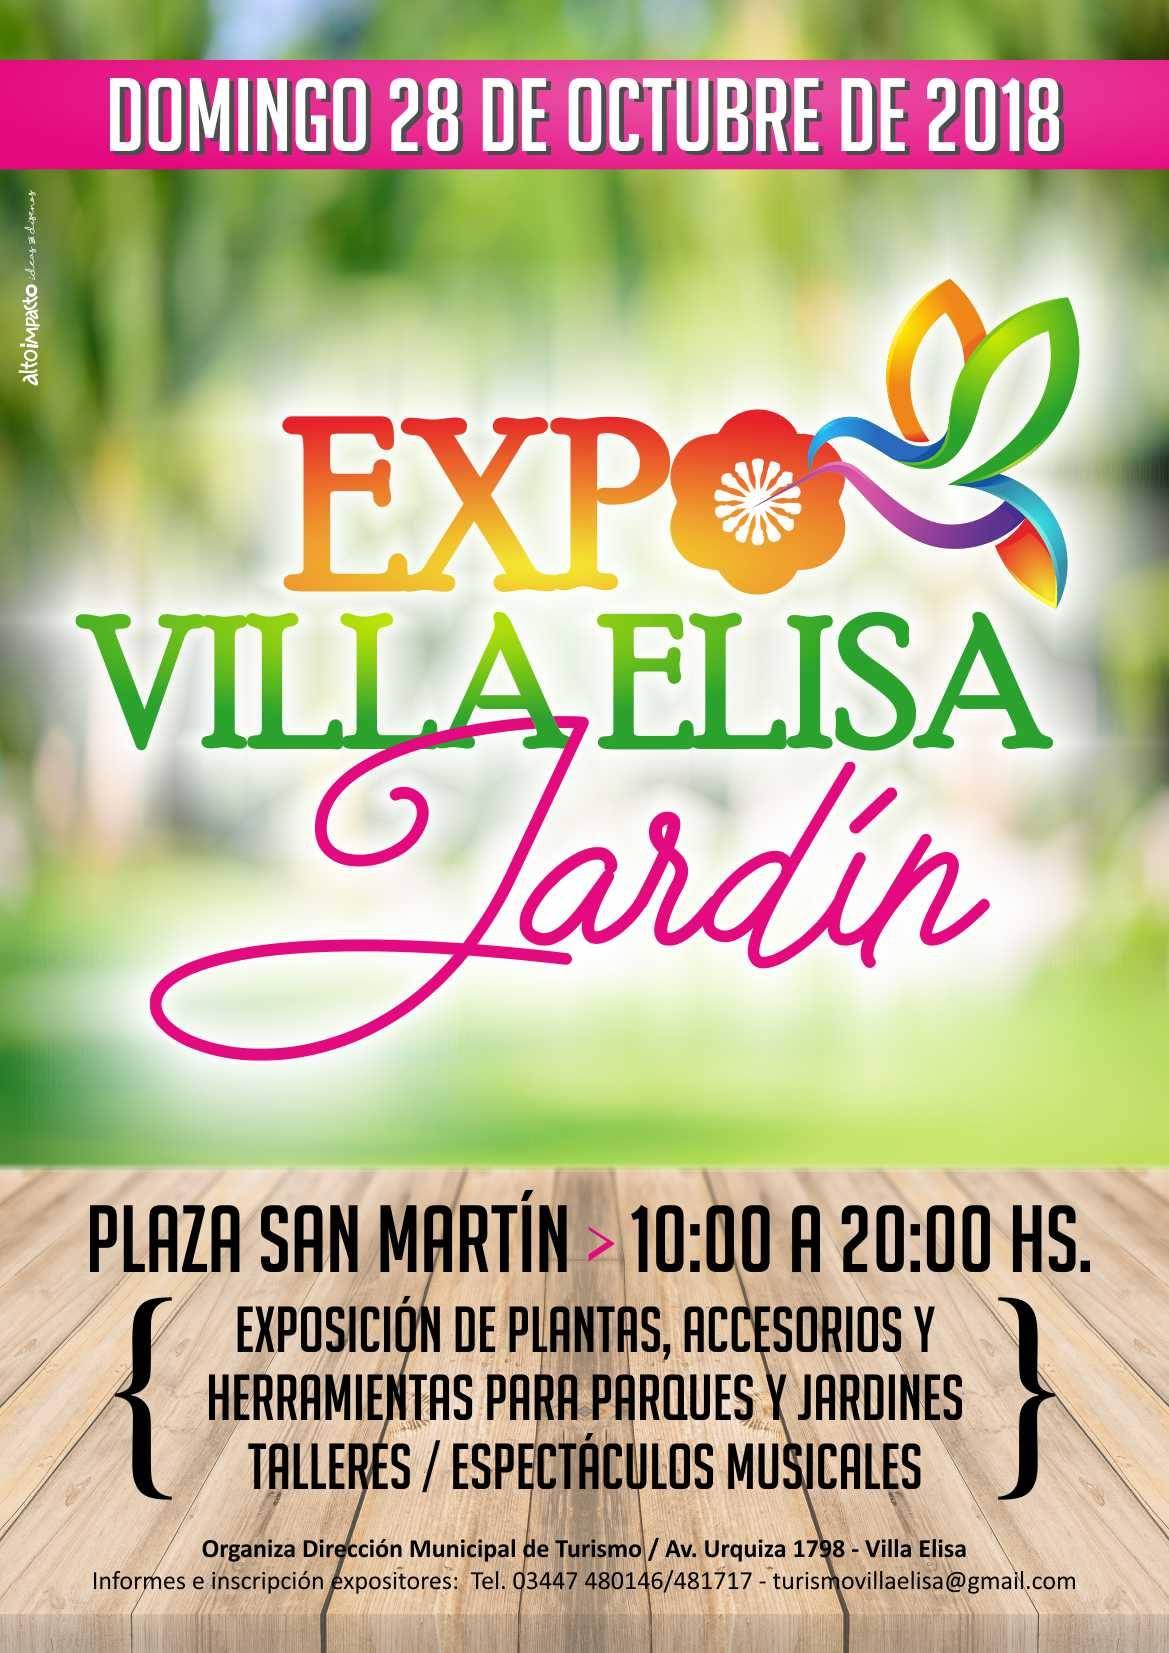 expo jardin v elisa